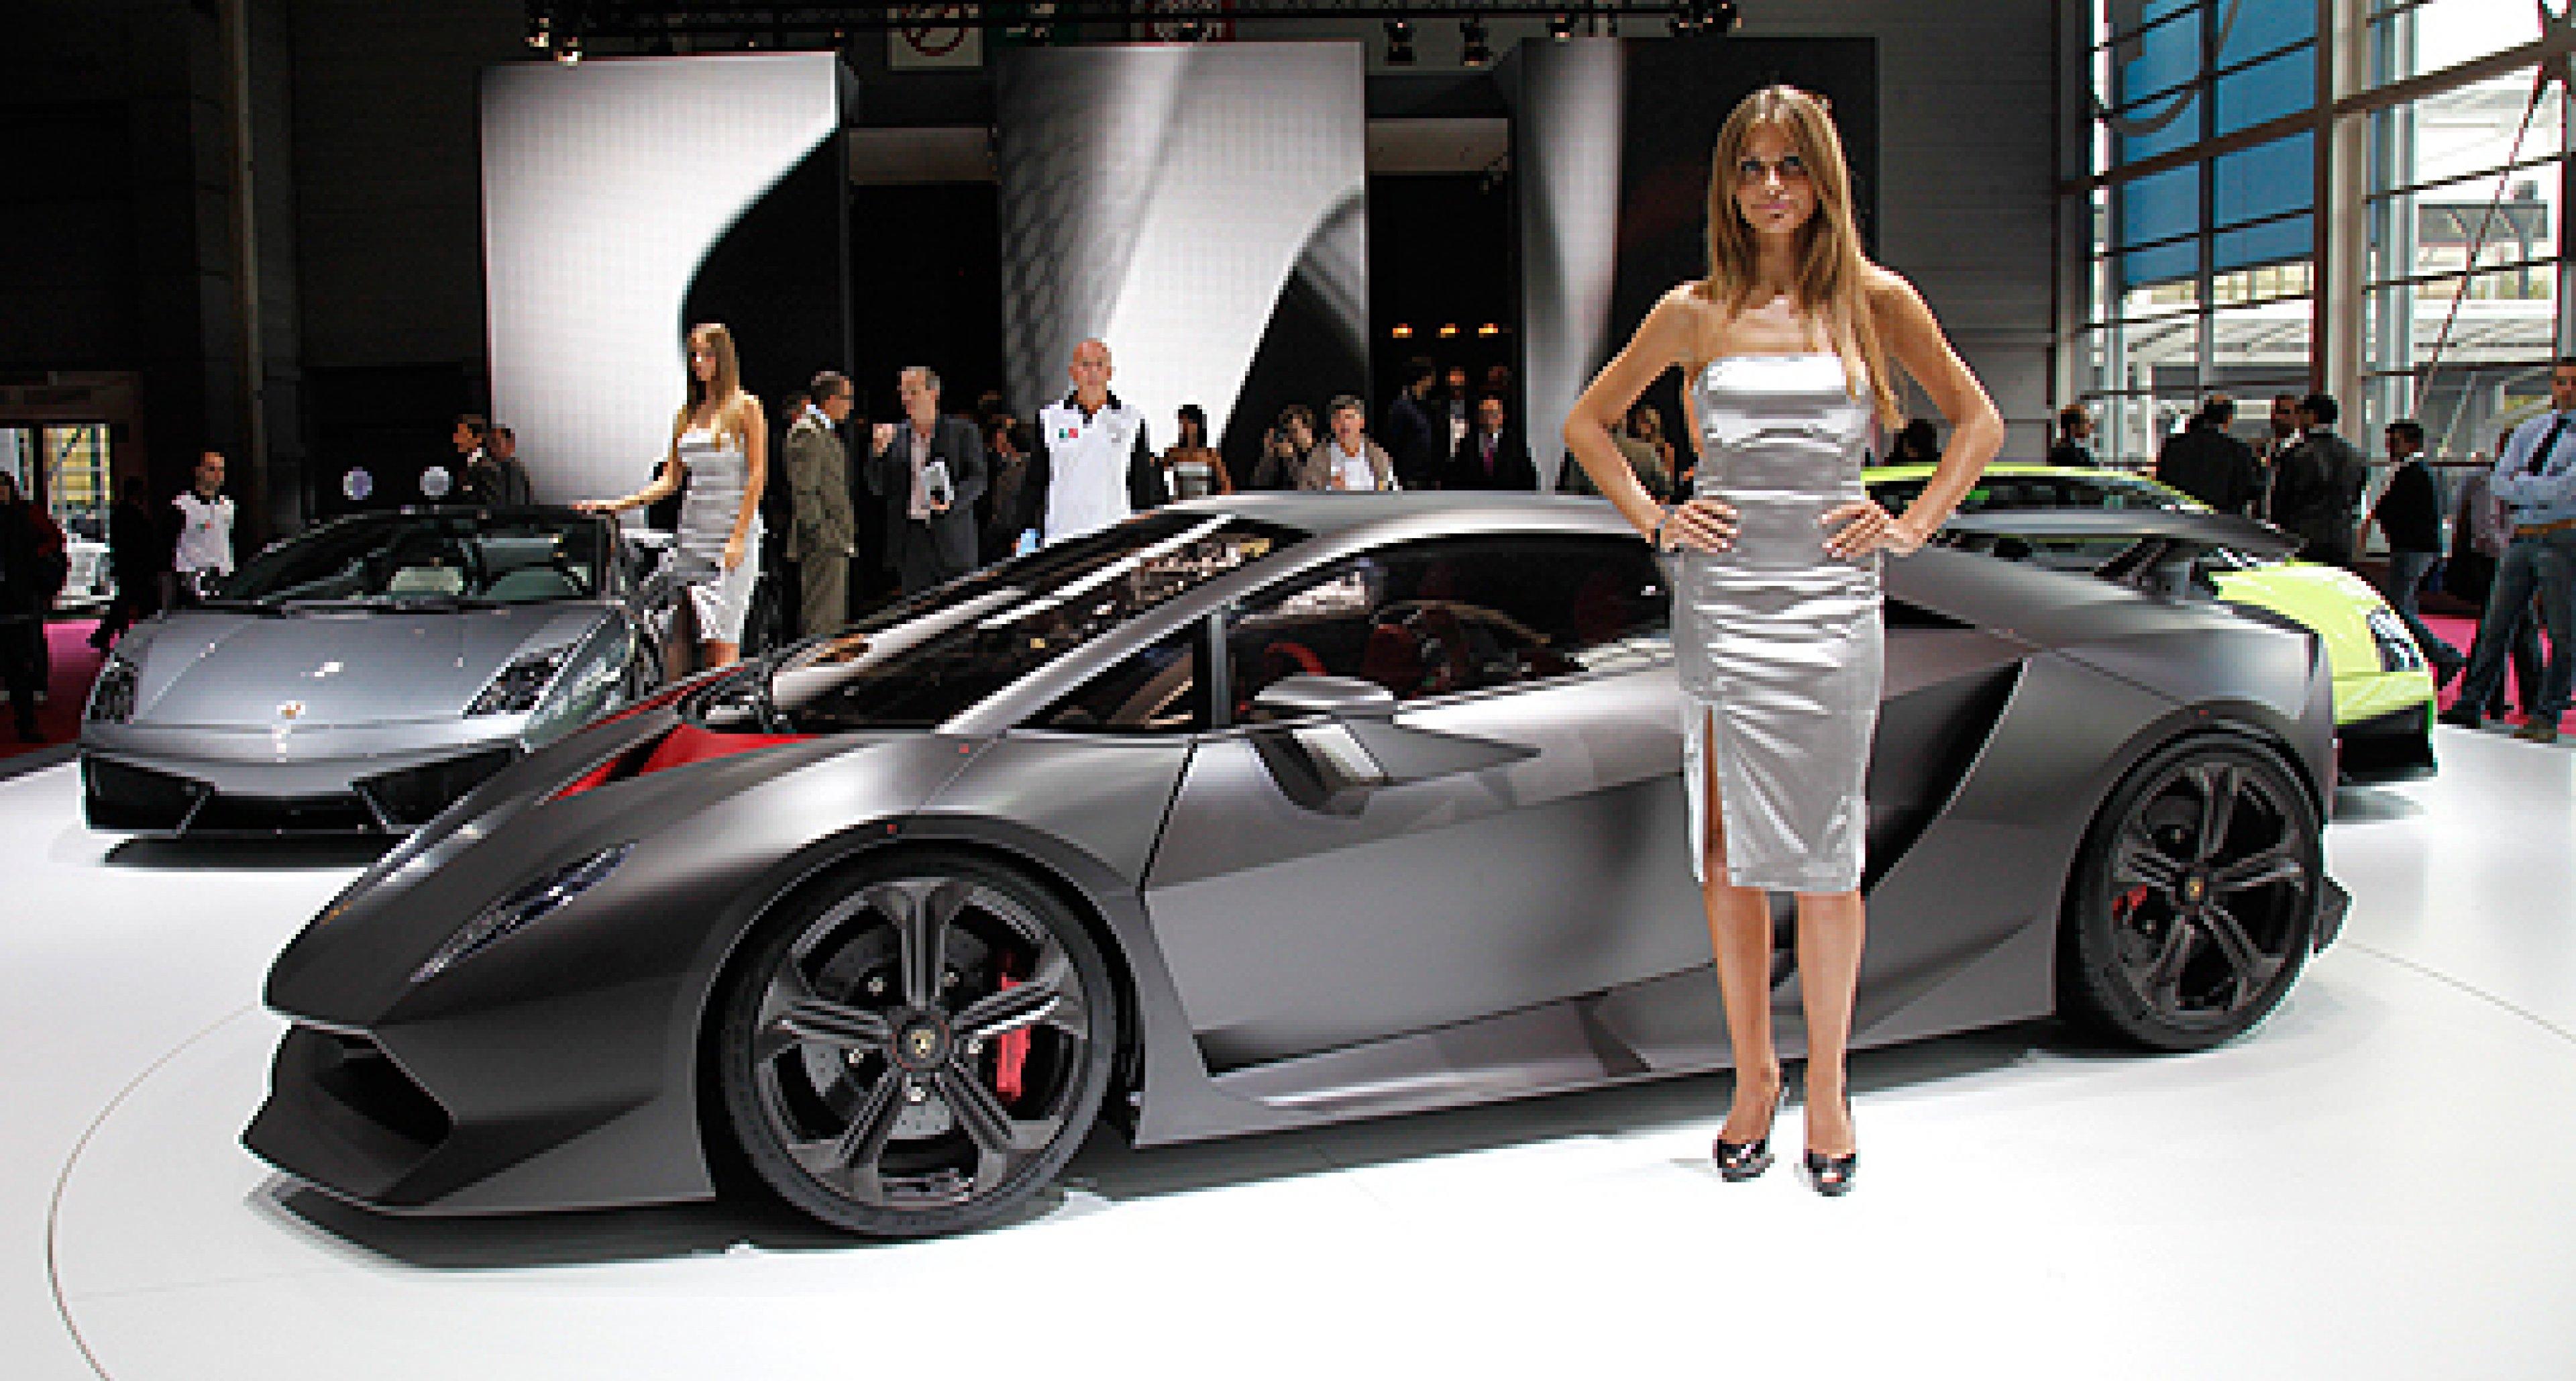 Paris Motor Show 2010: Photo Gallery